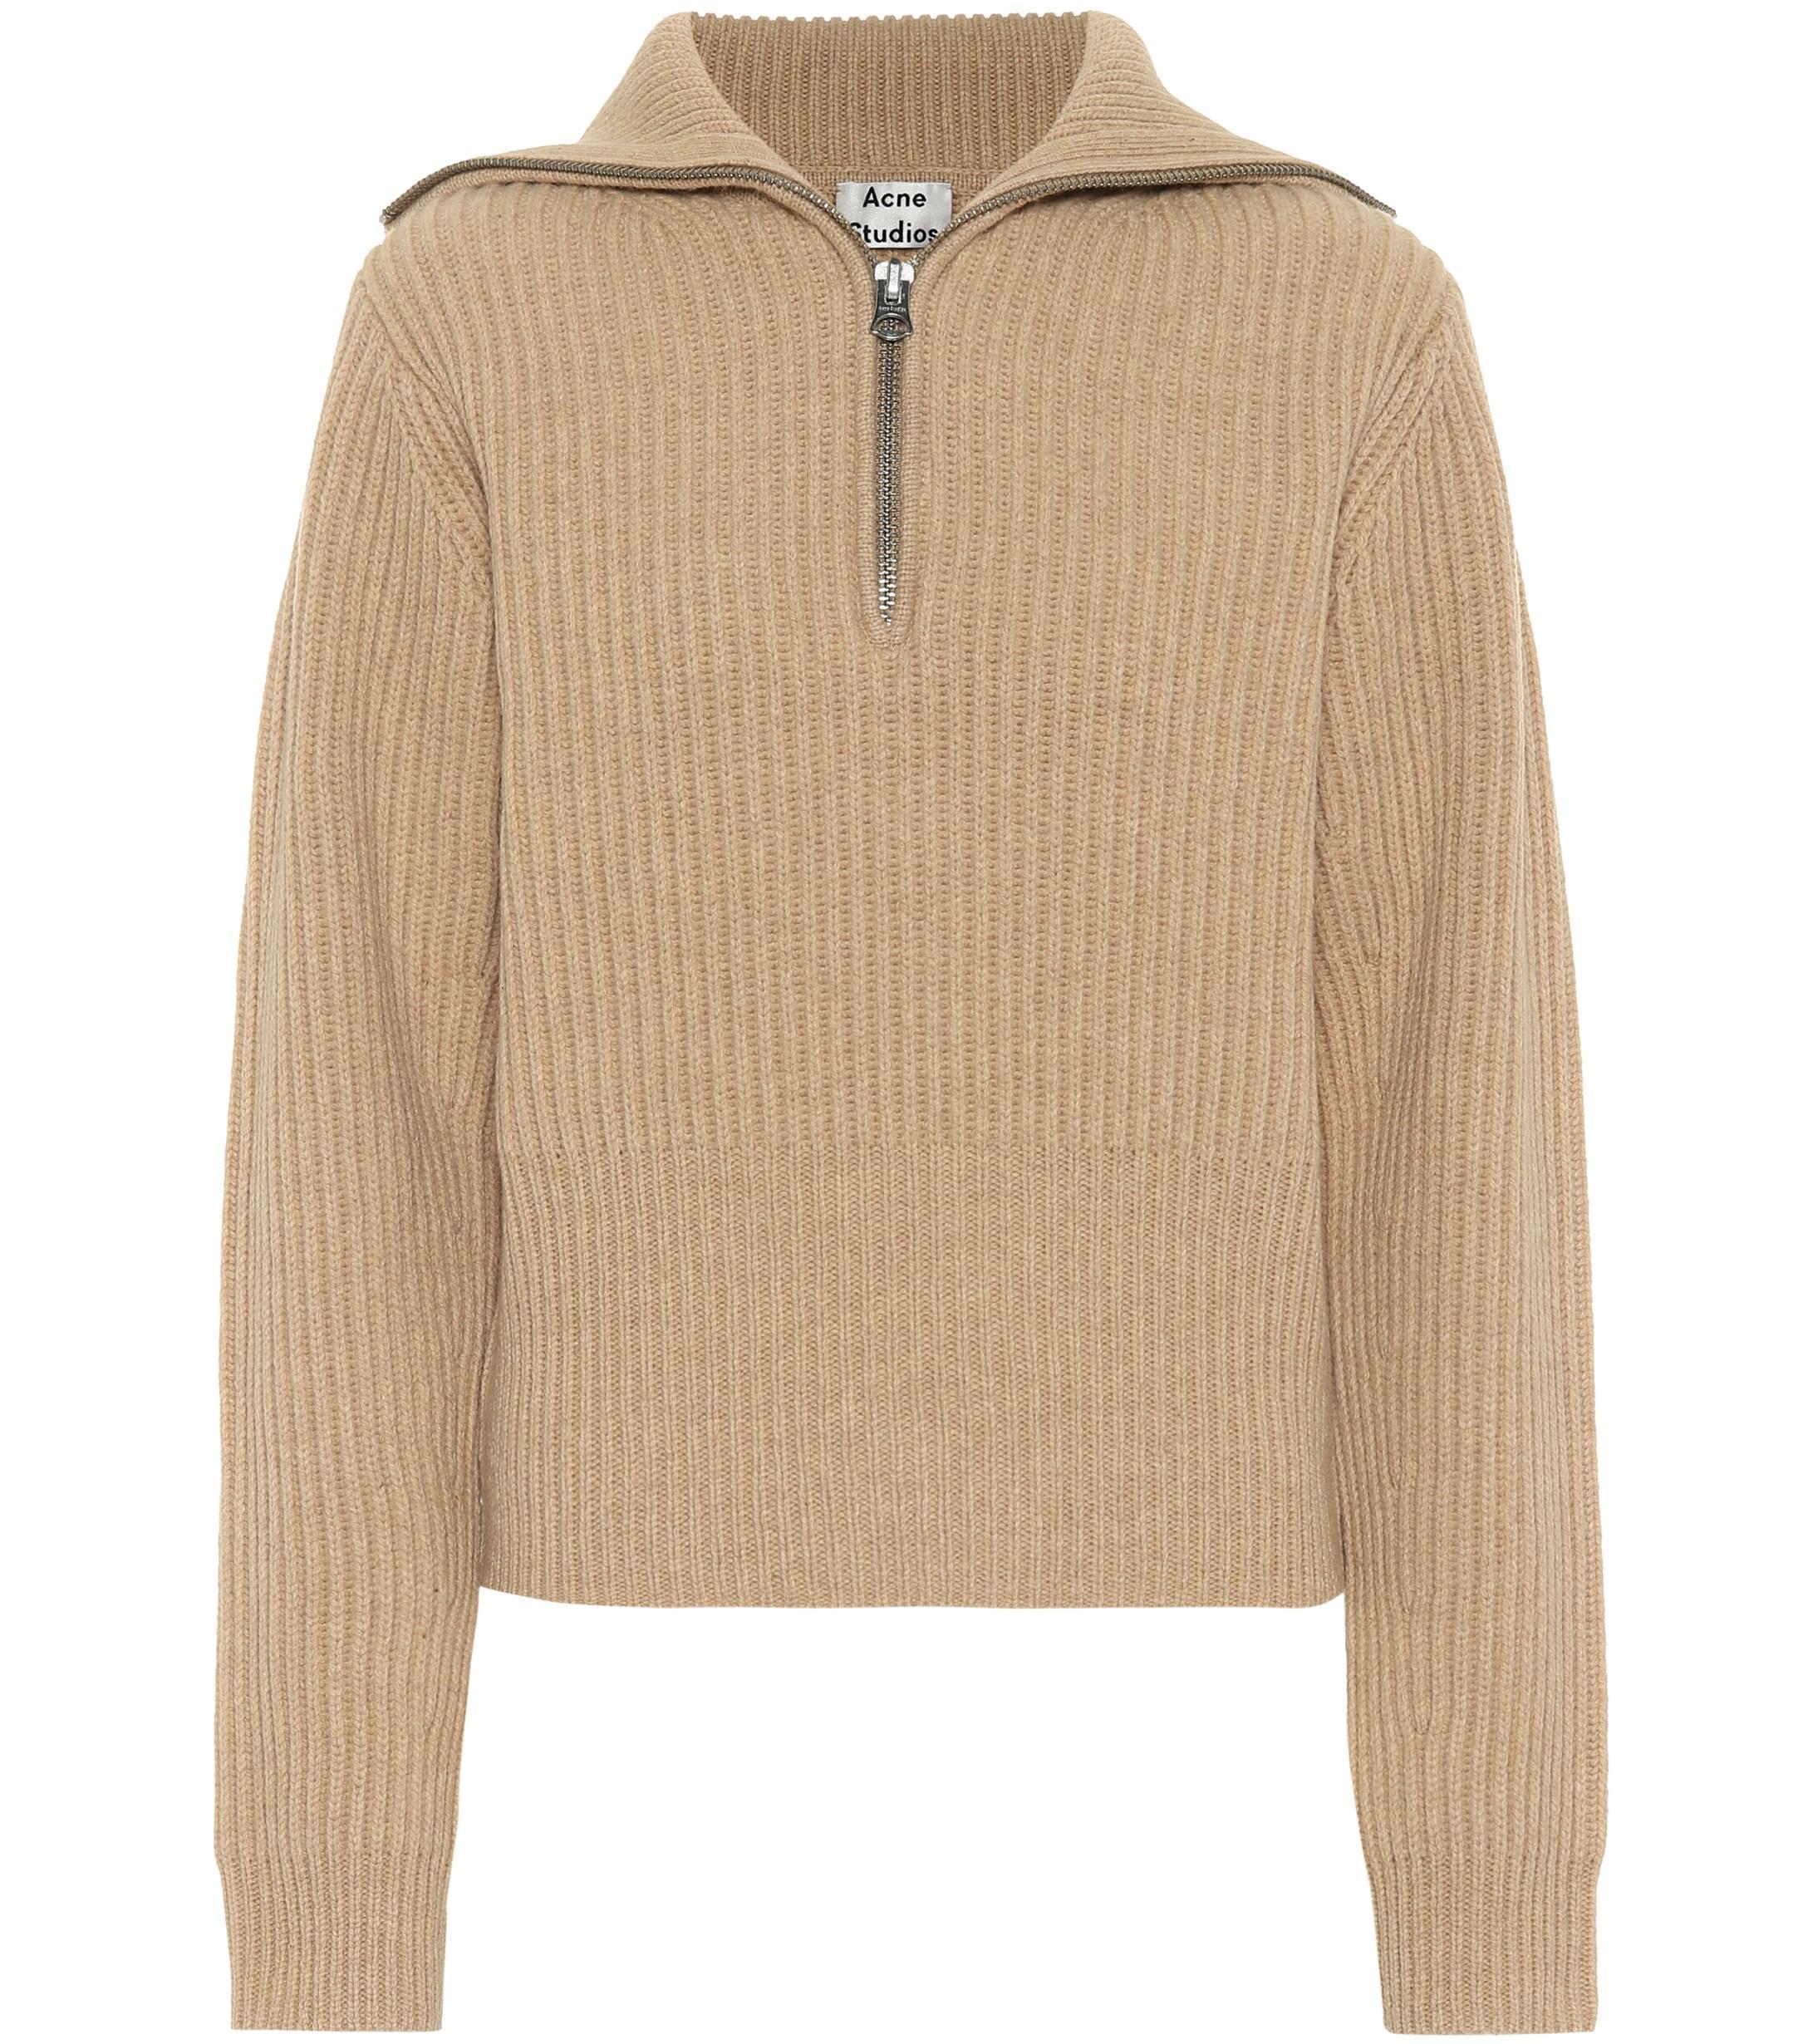 ee8b90baa1ea0 Lyst - Acne Studios Ribbed Wool Sweater in Natural - Save 1%